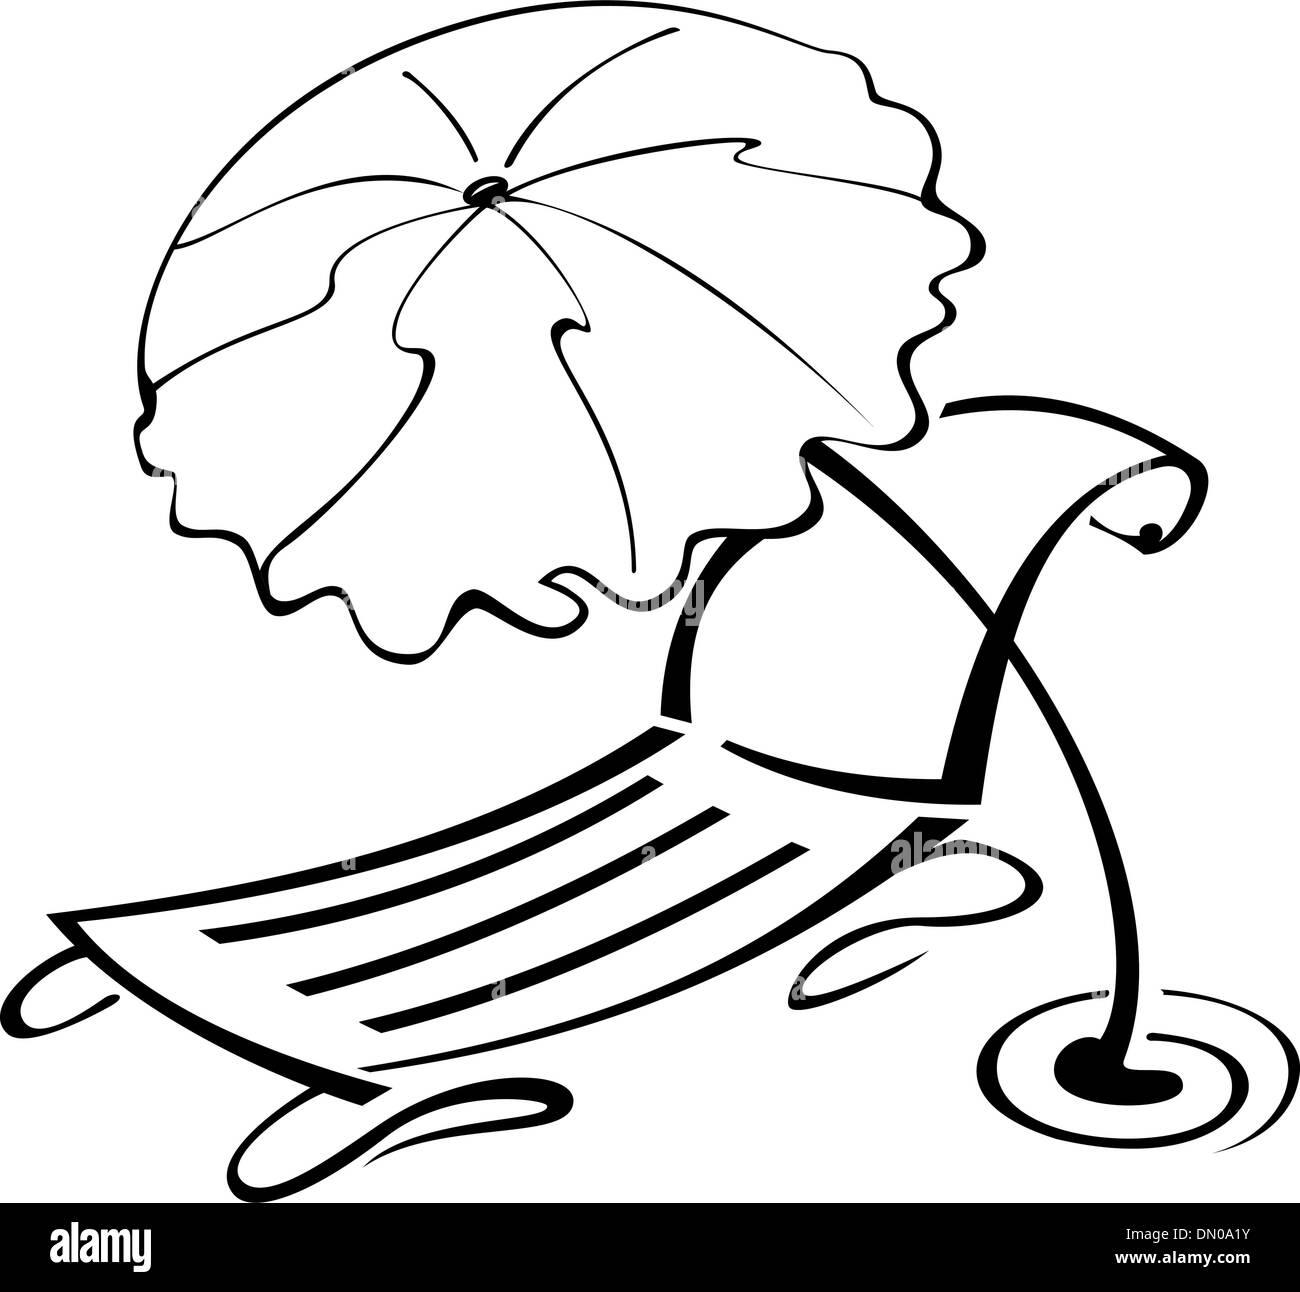 Beach chair and umbrella black and white - Black And White Contour Umbrella And Beach Chair Stock Vector